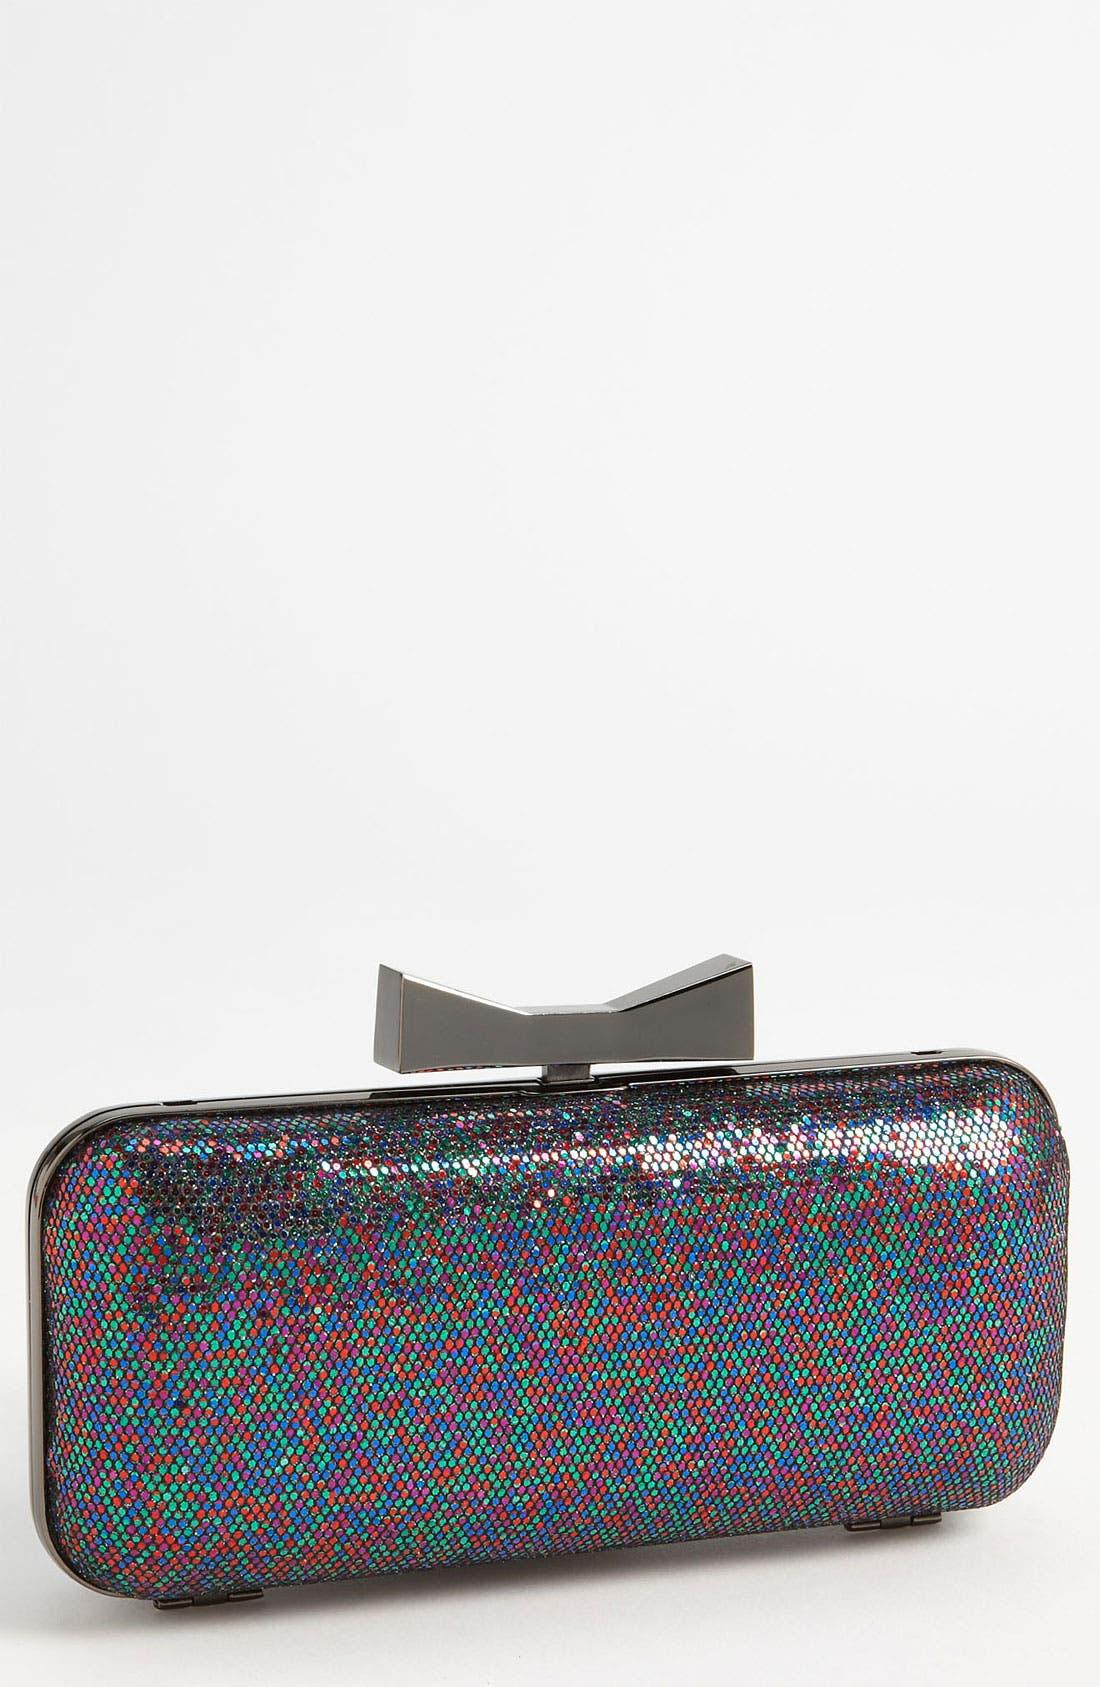 Main Image - Natasha Couture 'Glitter' Clutch